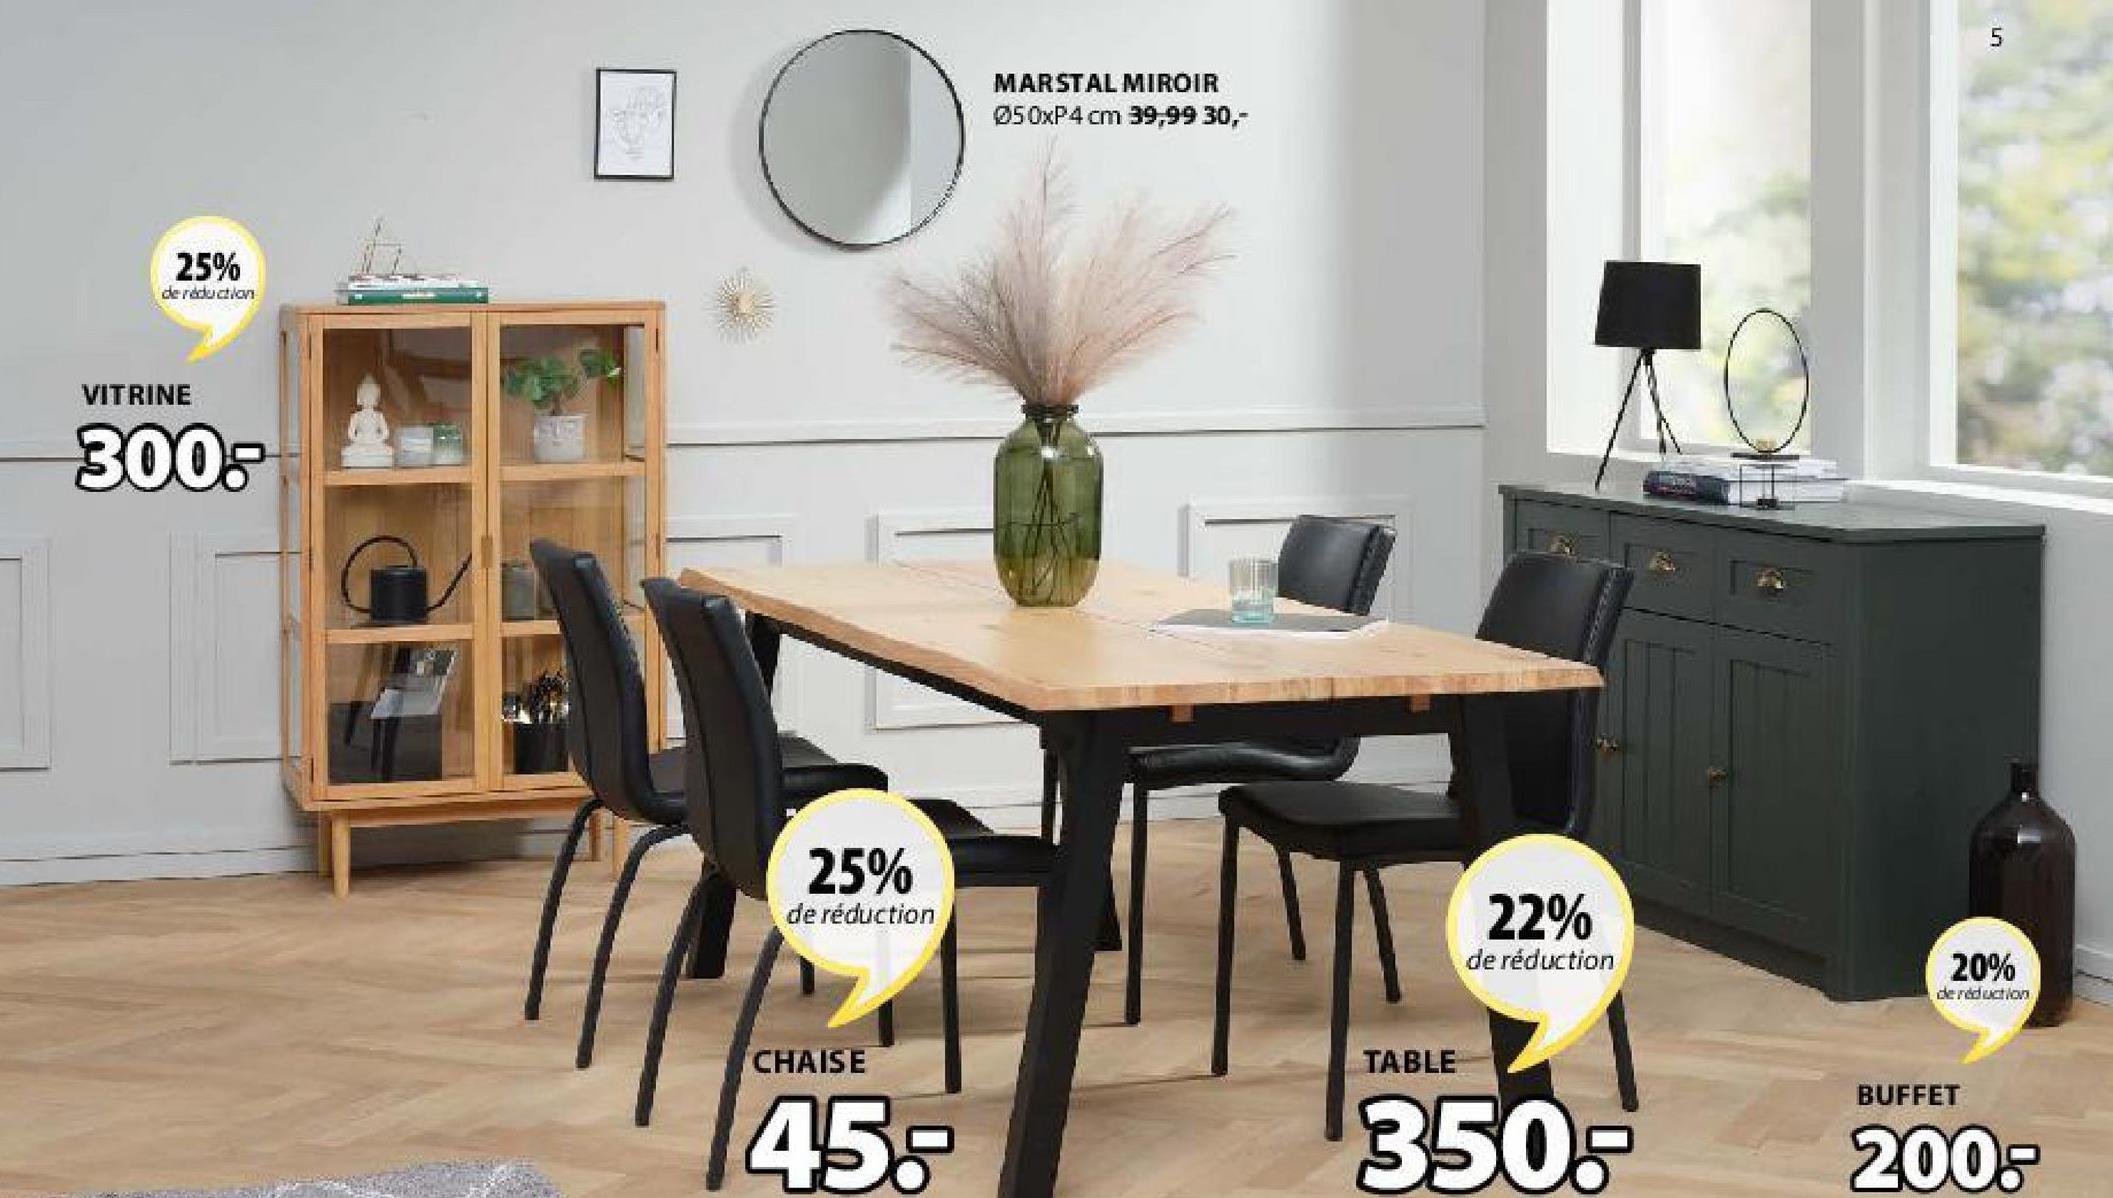 5 MARSTAL MIROIR Ø50xP4 cm 39,99 30,- 25% de reduction VITRINE 300: 25% de réduction 22% de réduction 20% de reduction CHAISE TABLE BUFFET 45. 350.- 200-